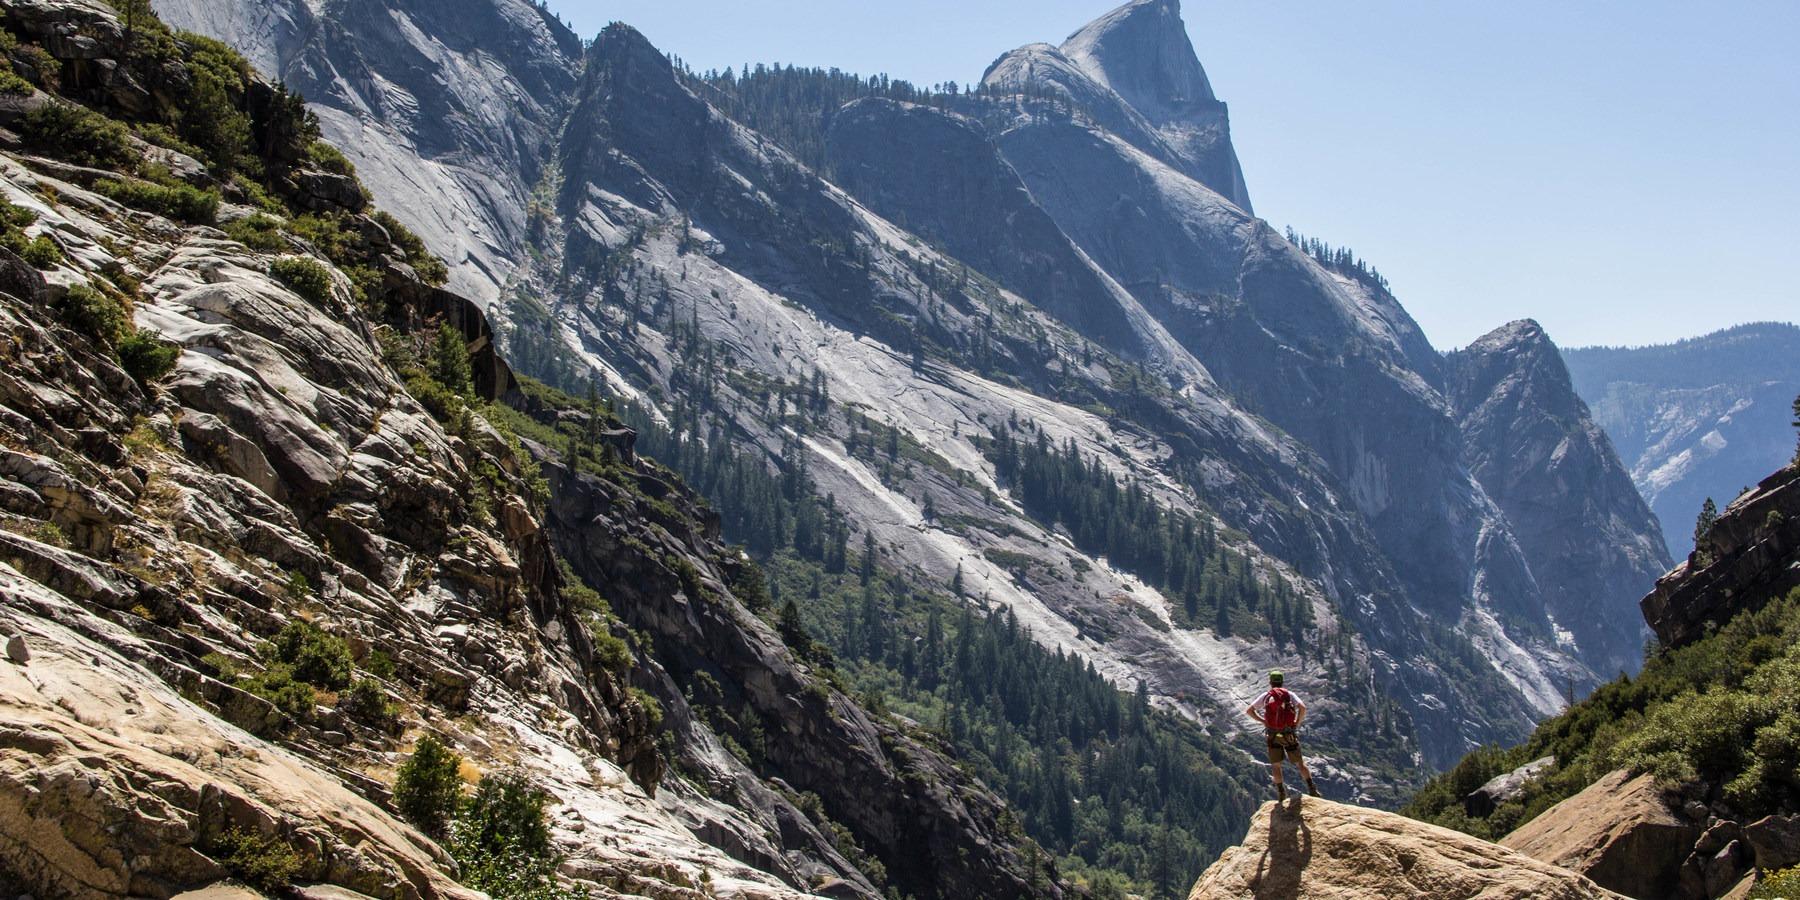 Tenaya Canyon Descent Outdoor Project